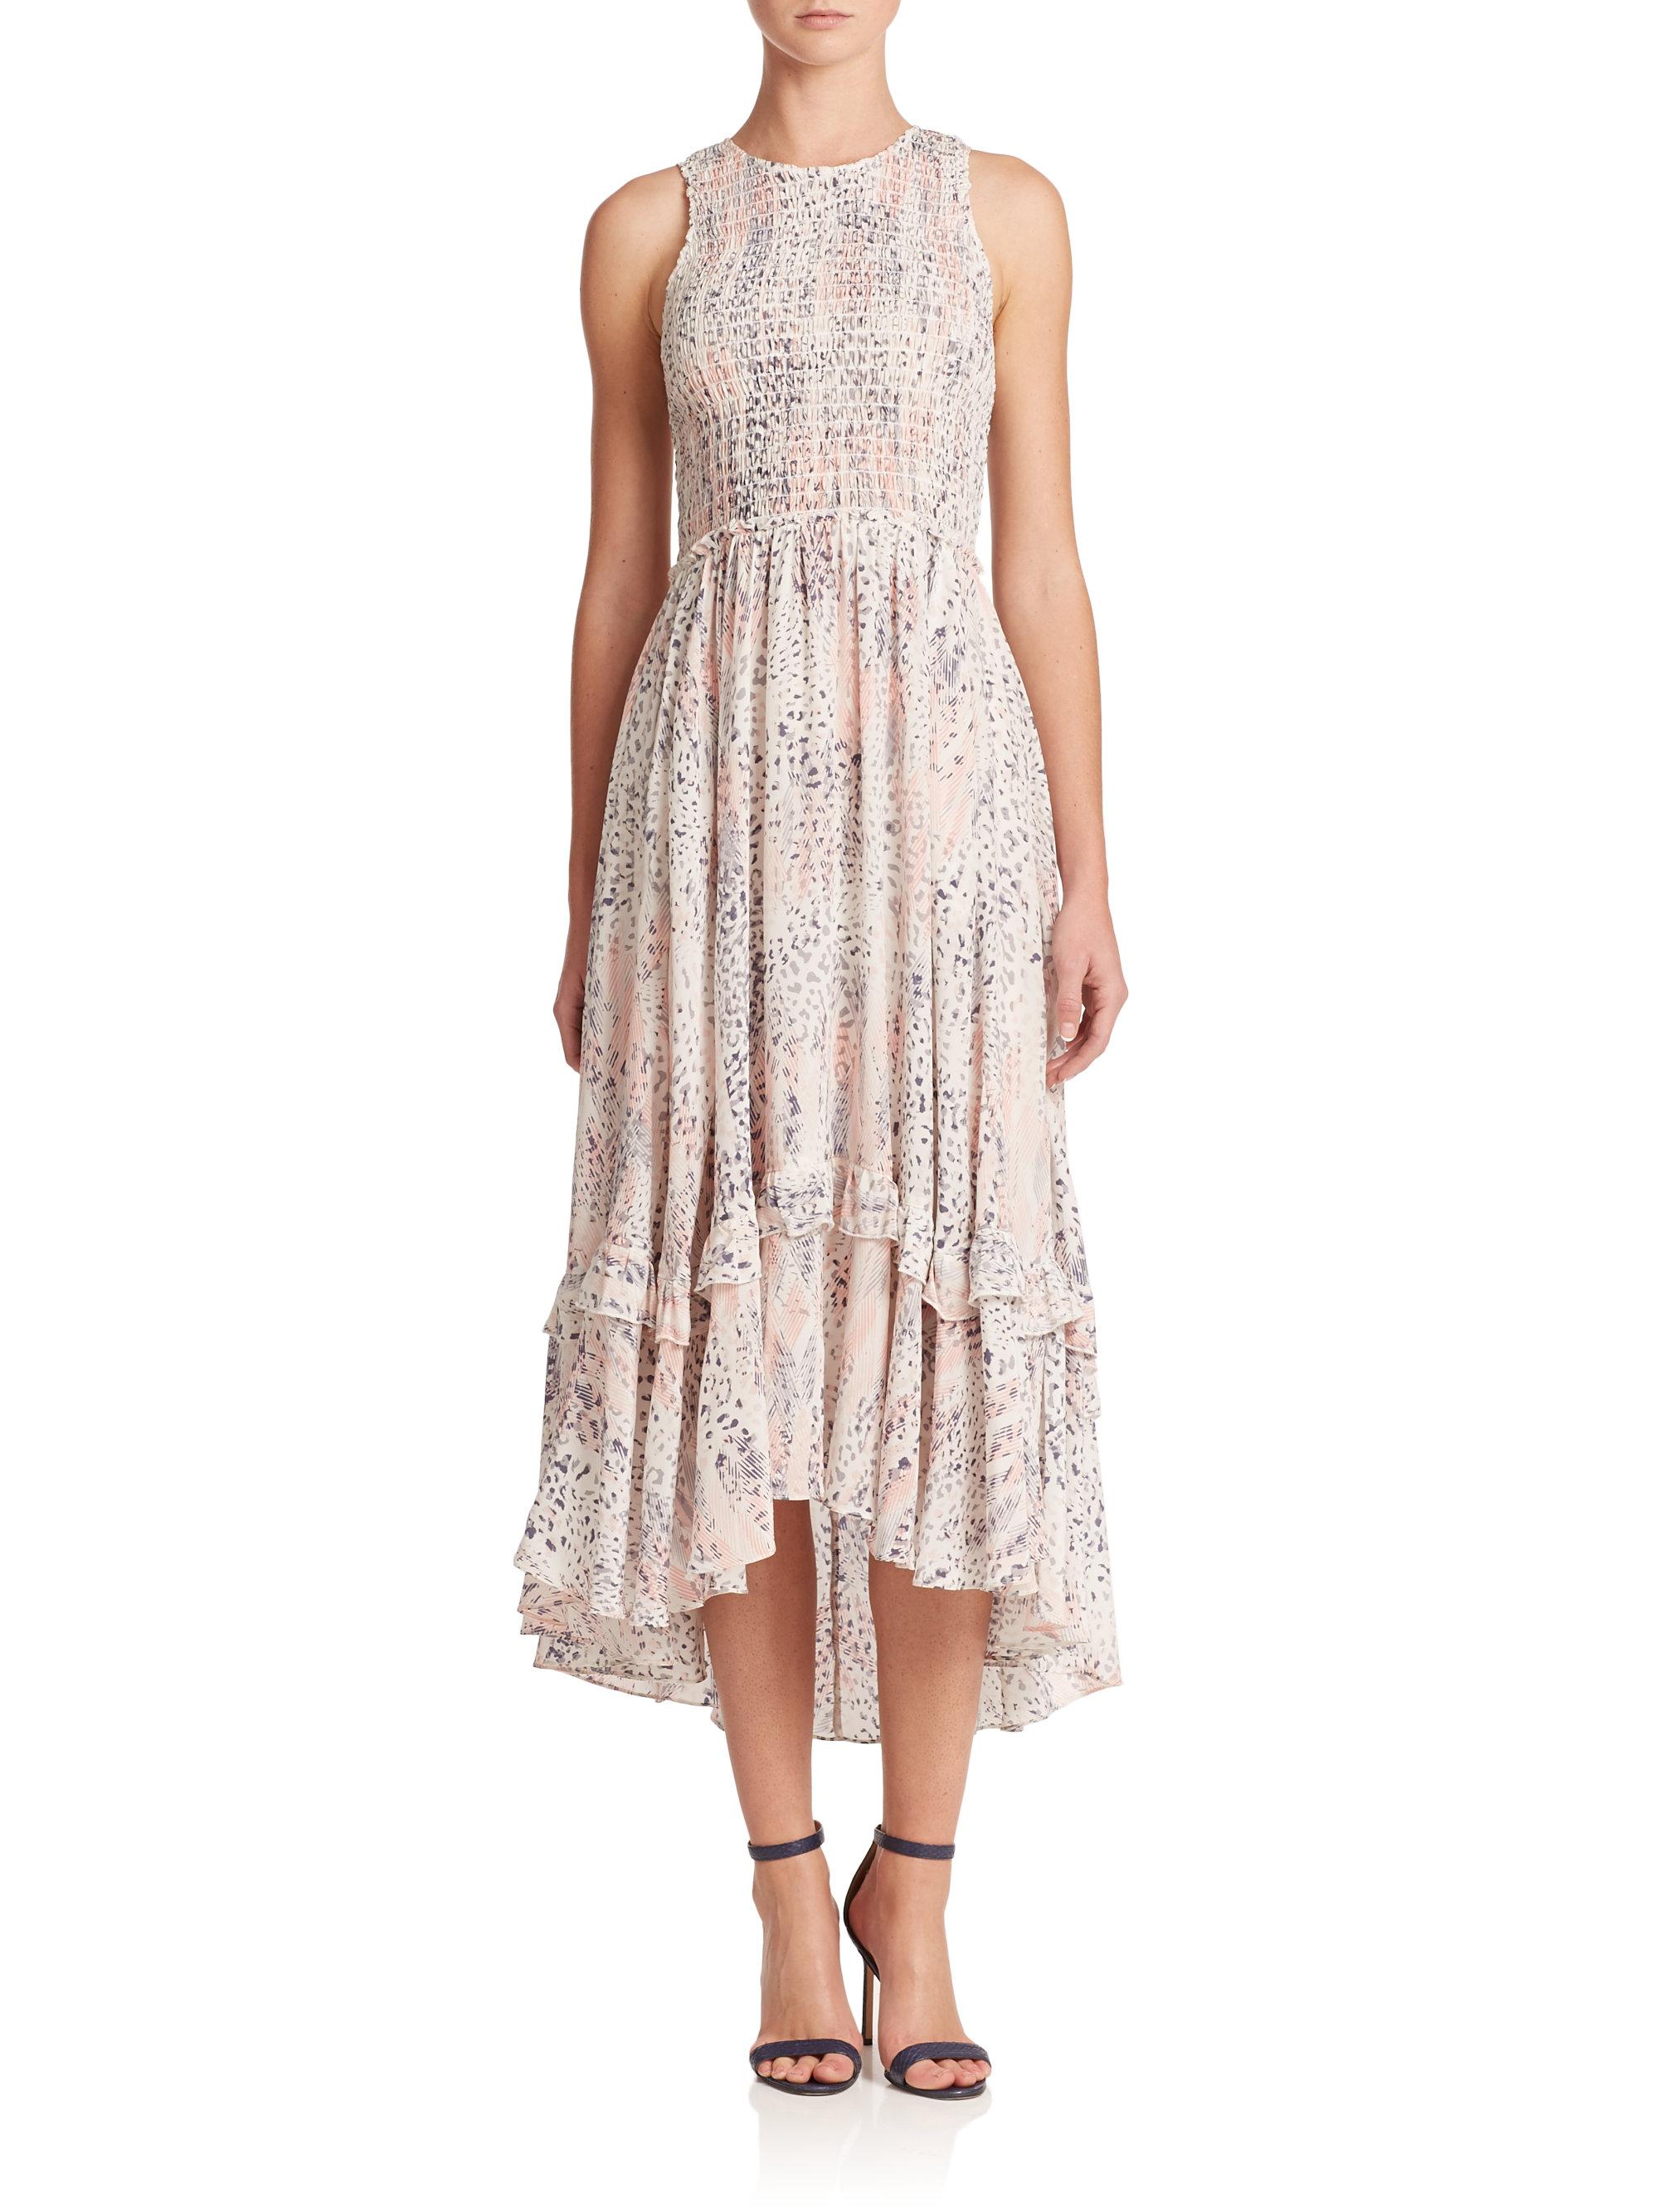 Lyst - Rebecca Taylor Sum Leo Silk Hi-lo Dress in Pink